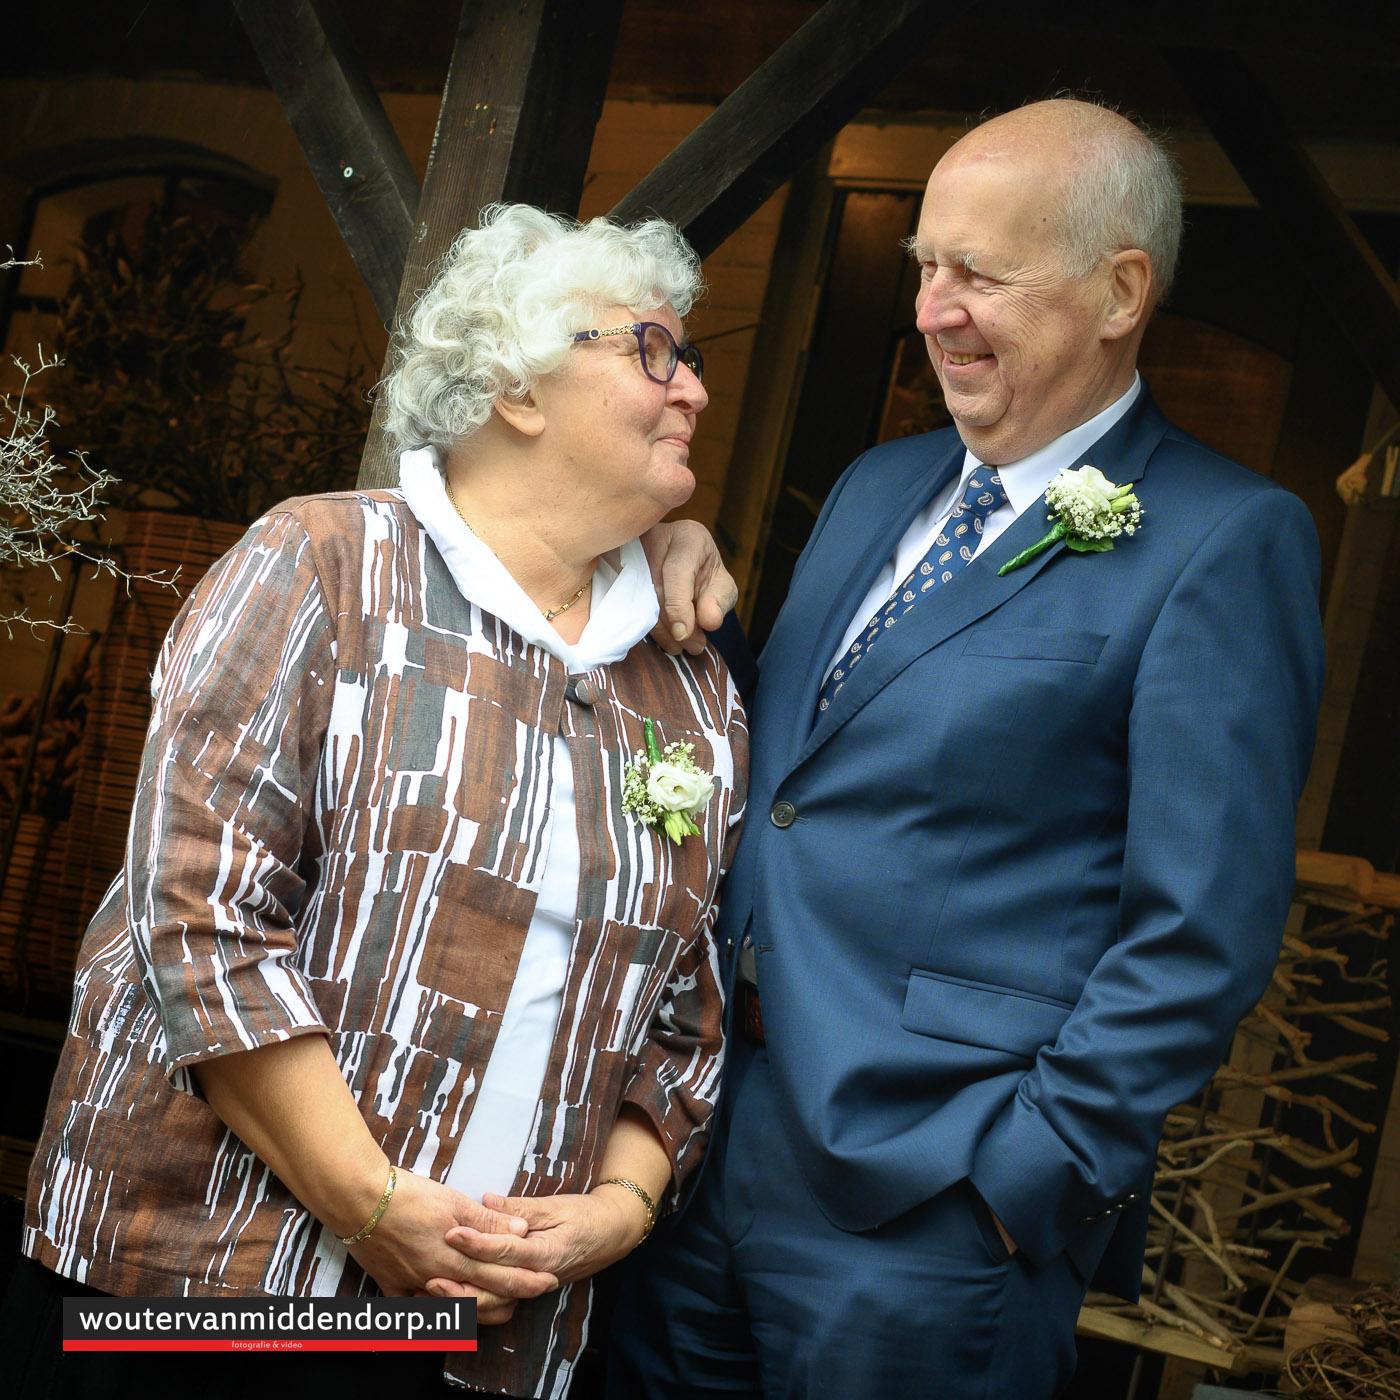 bruidsfotografie Wouter van Middendorp Uddel Elspeet Barneveld, omgeving trouwfotograaf-23